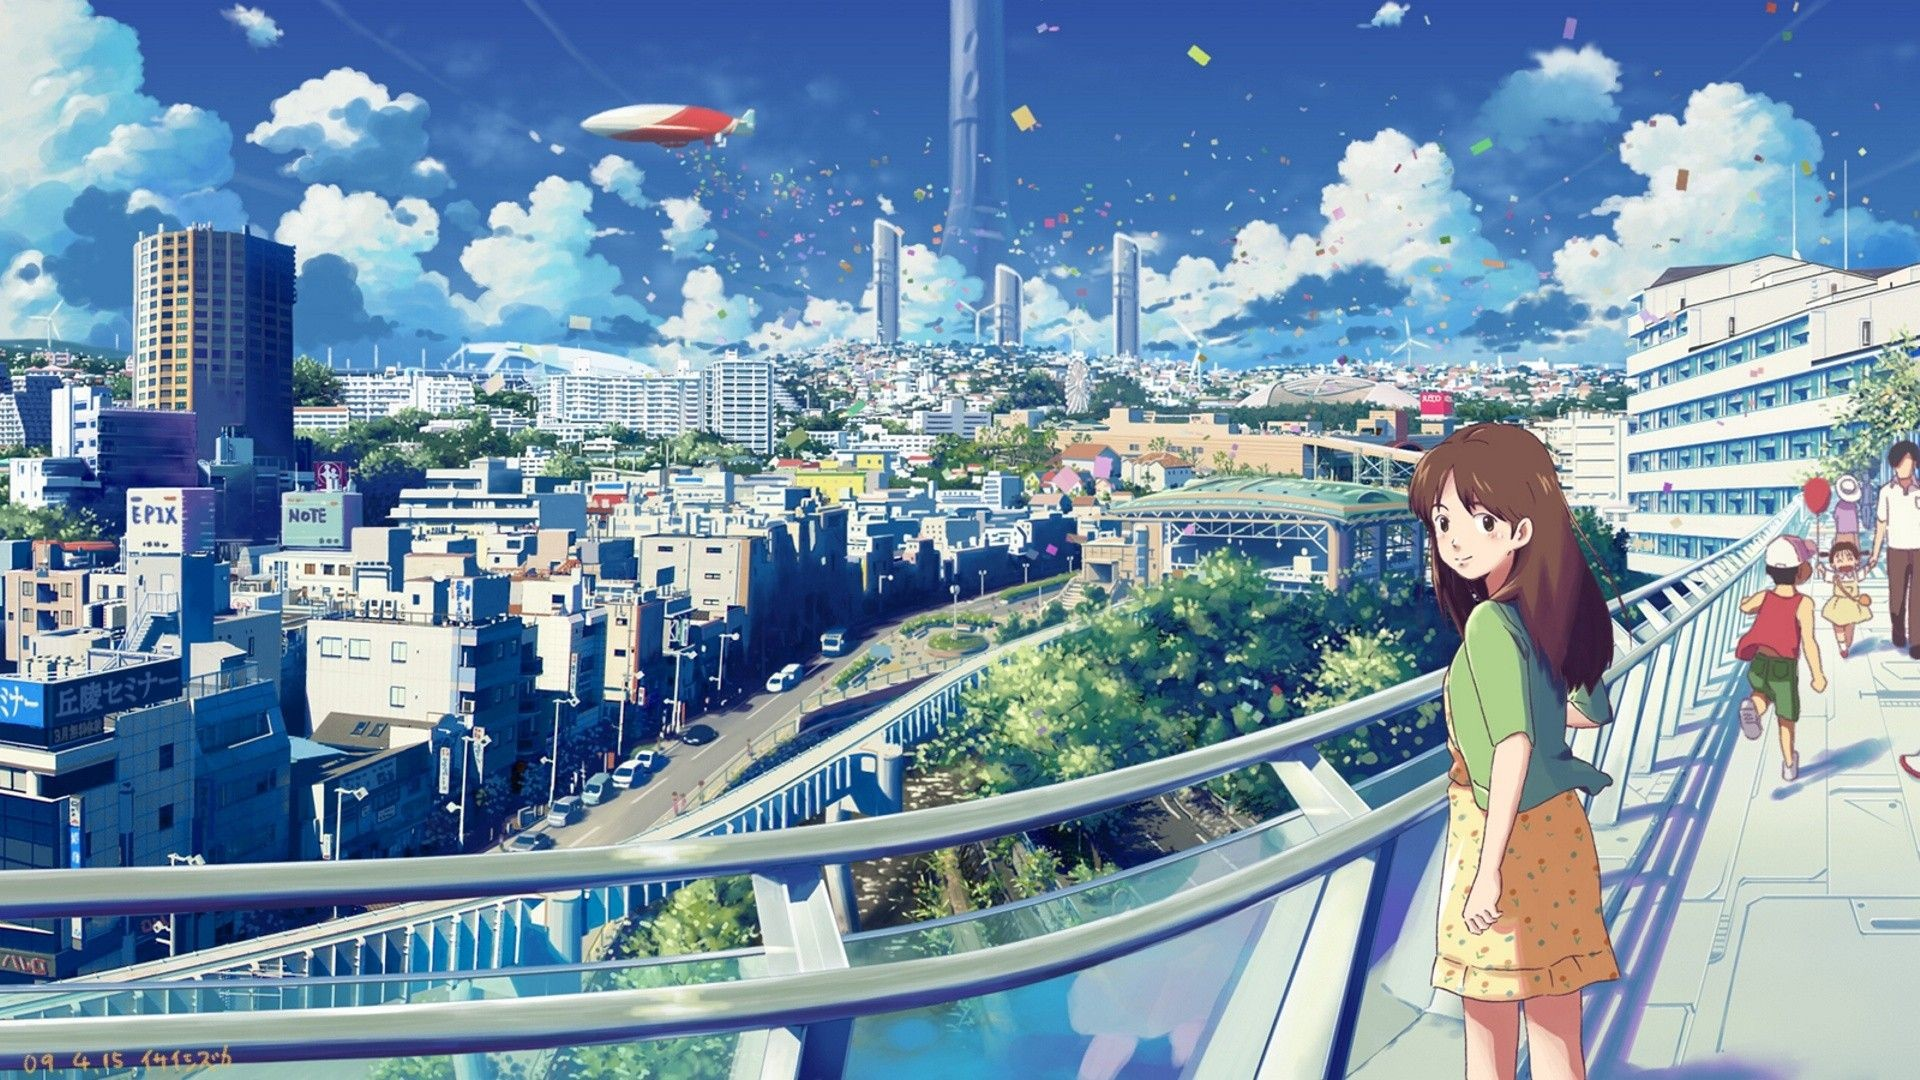 Anime Scenery Wallpaper - Anime Wallpaper City , HD Wallpaper & Backgrounds